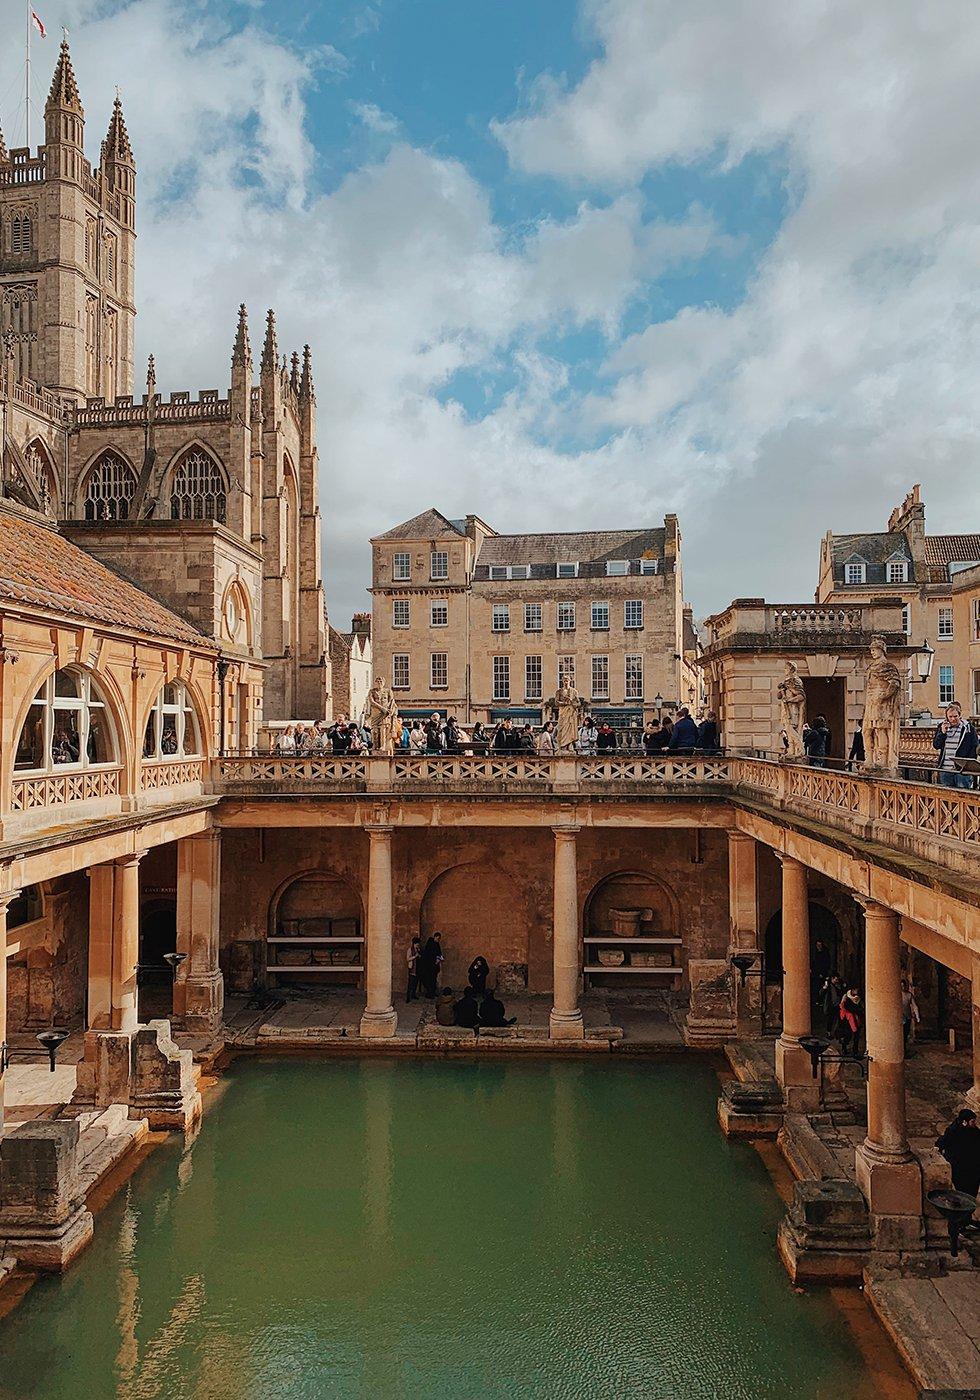 Visiting Bath, England - Honestly WTF